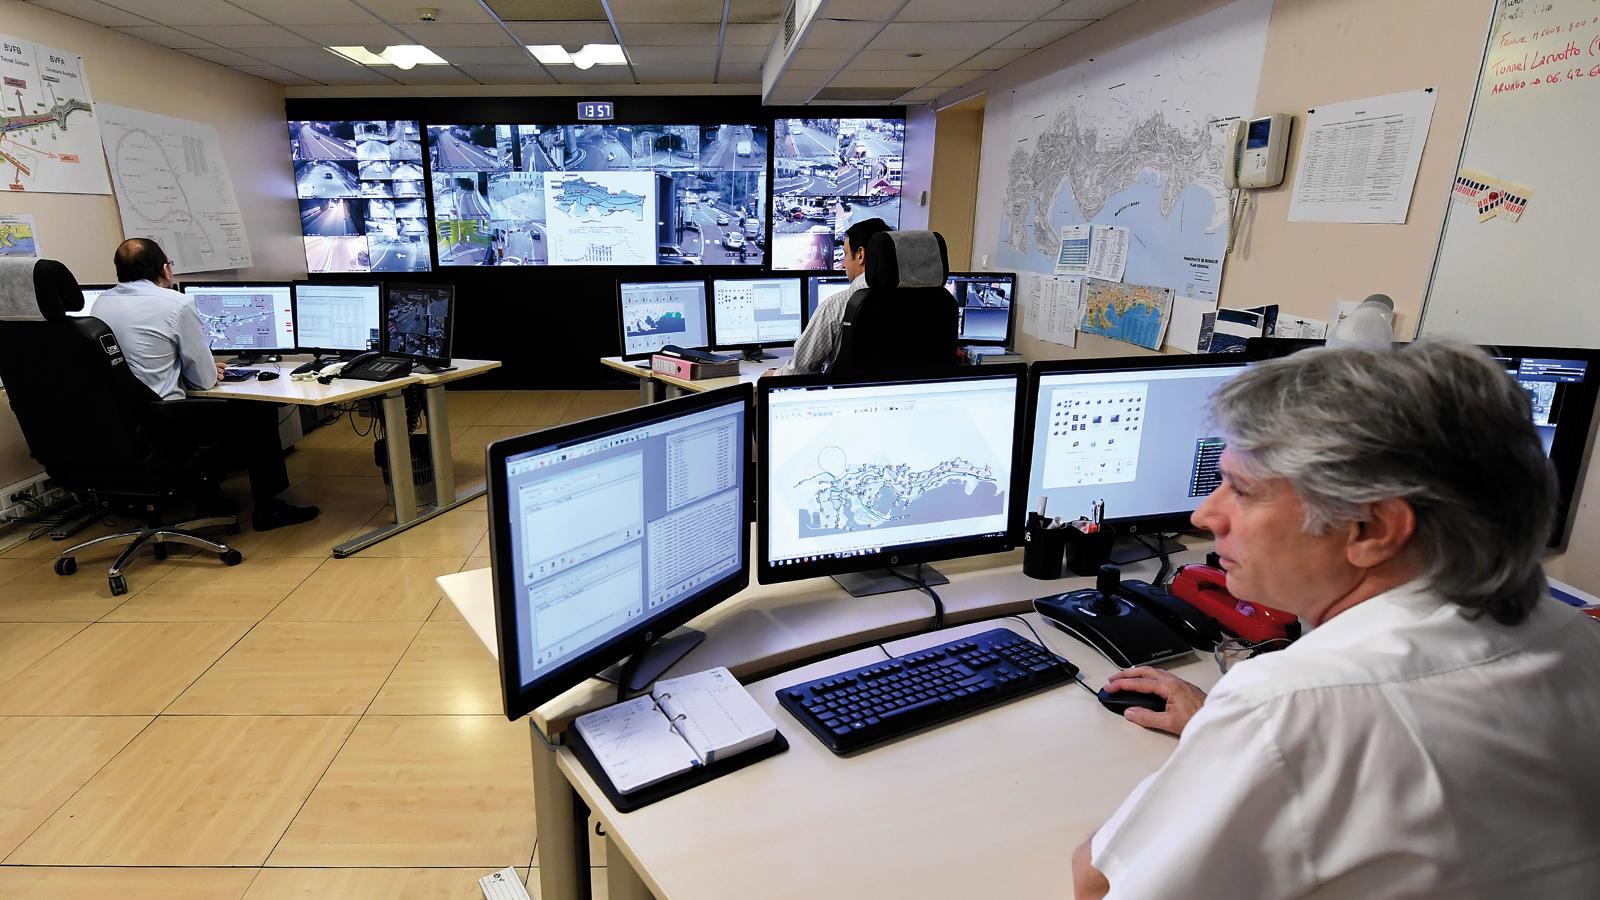 Centre-gestion-de-la-mobilite-@-CIGM